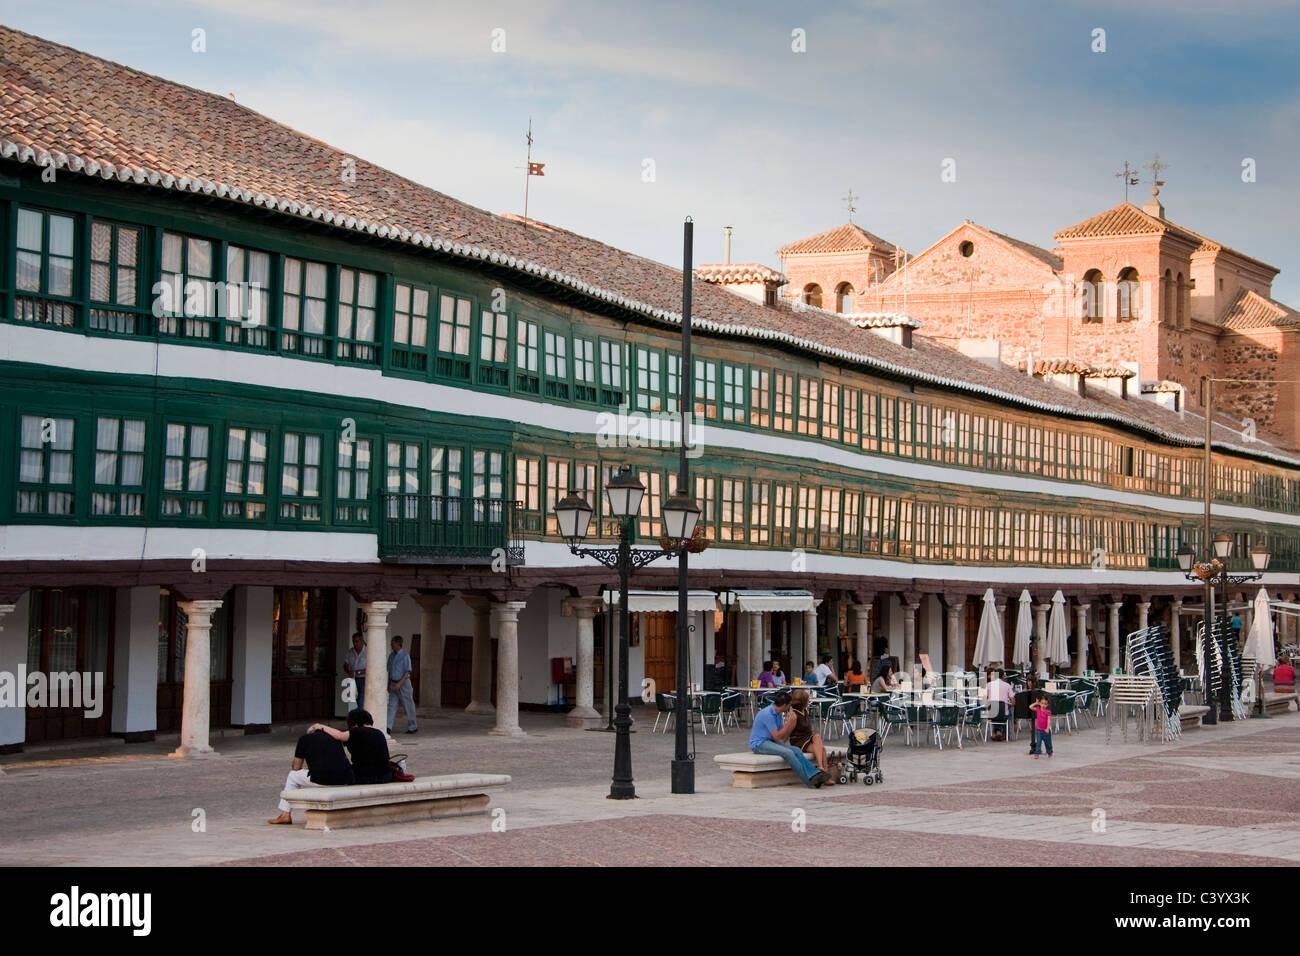 Spain, Europe, Spain, La Mancha, Almagro, mayor Burstting, building, construction, - Stock Image